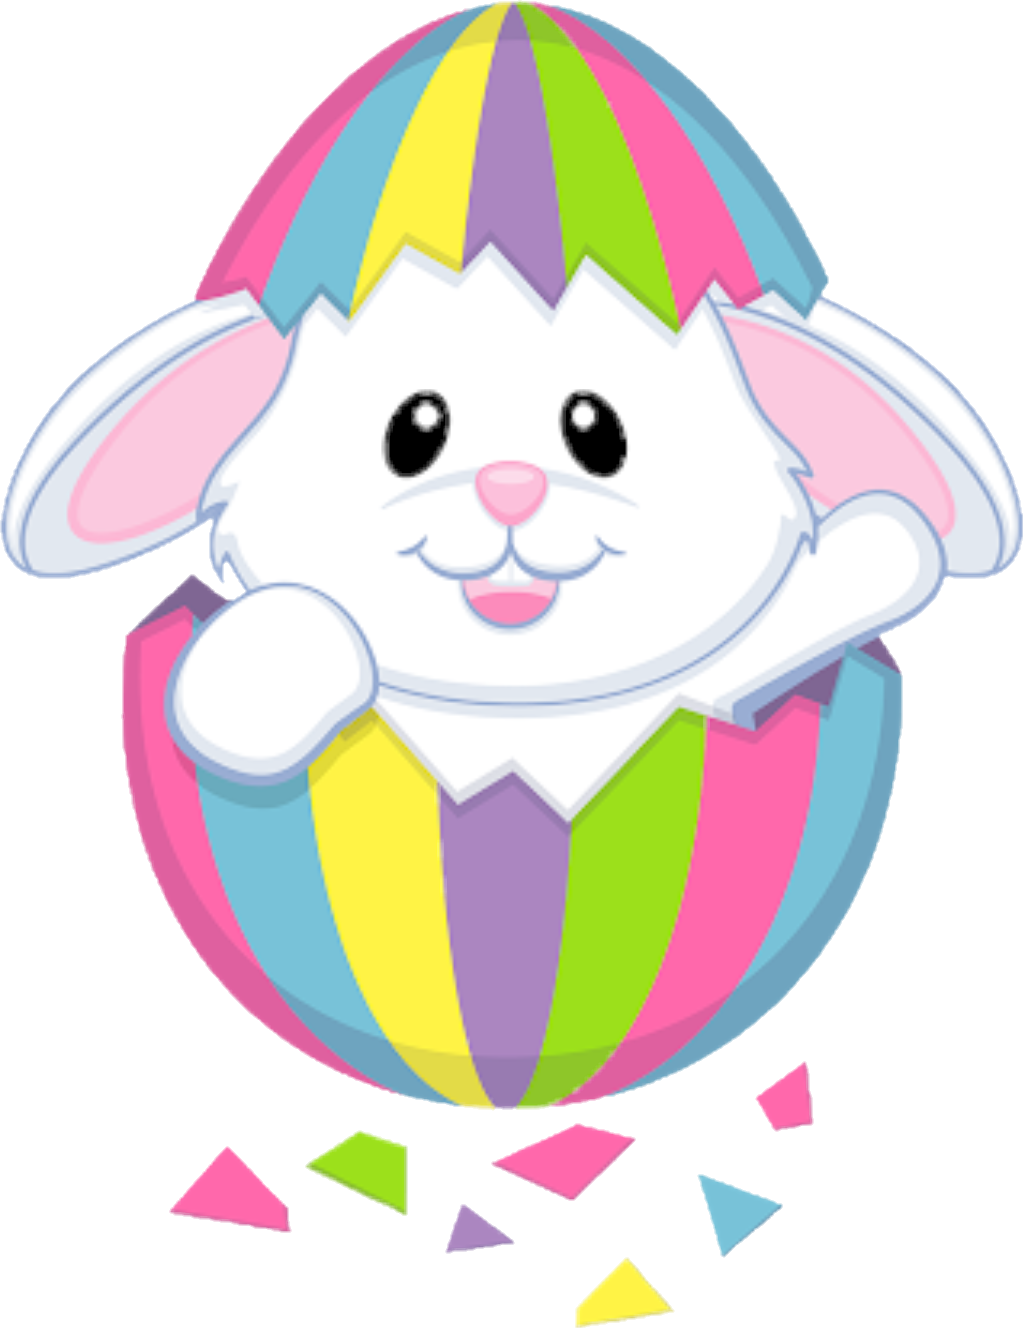 Clipart rainbow rabbit. Freetoedit rabbits colors easter